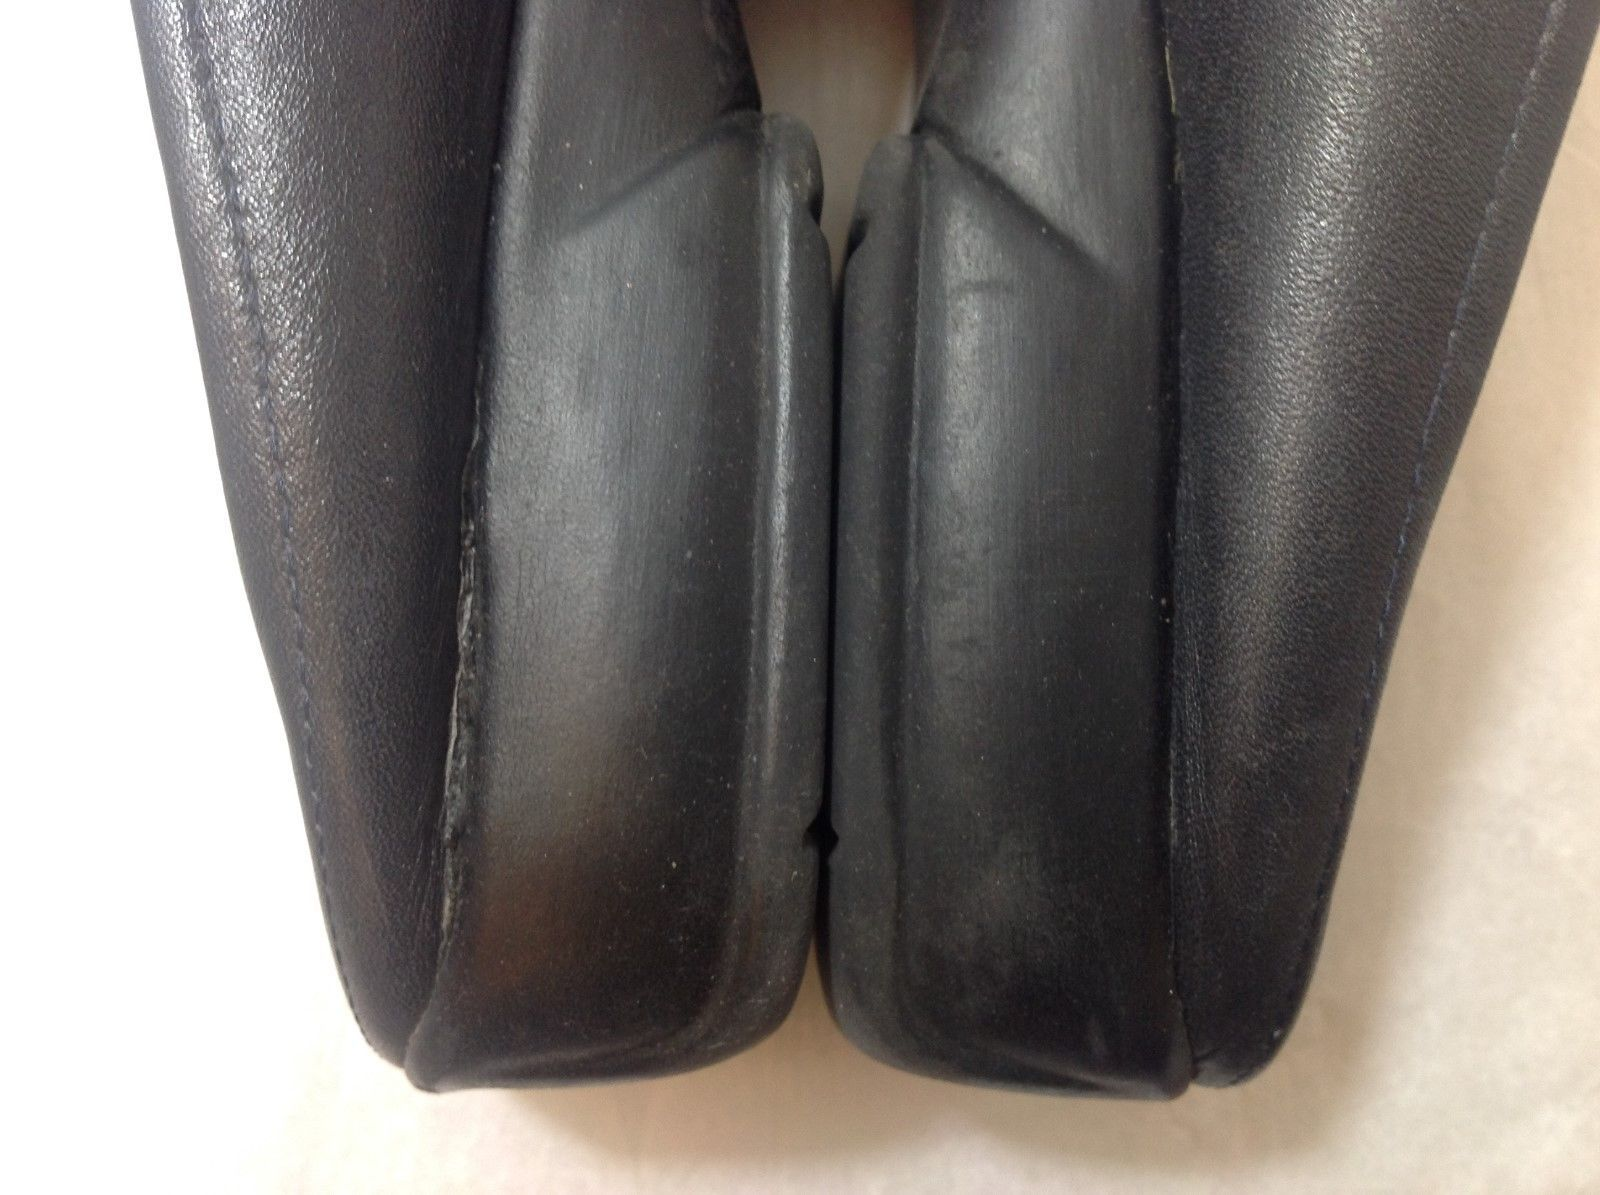 b50dccb6e1b7 Men s Black BASS Slippers Sz 11M and 50 similar items